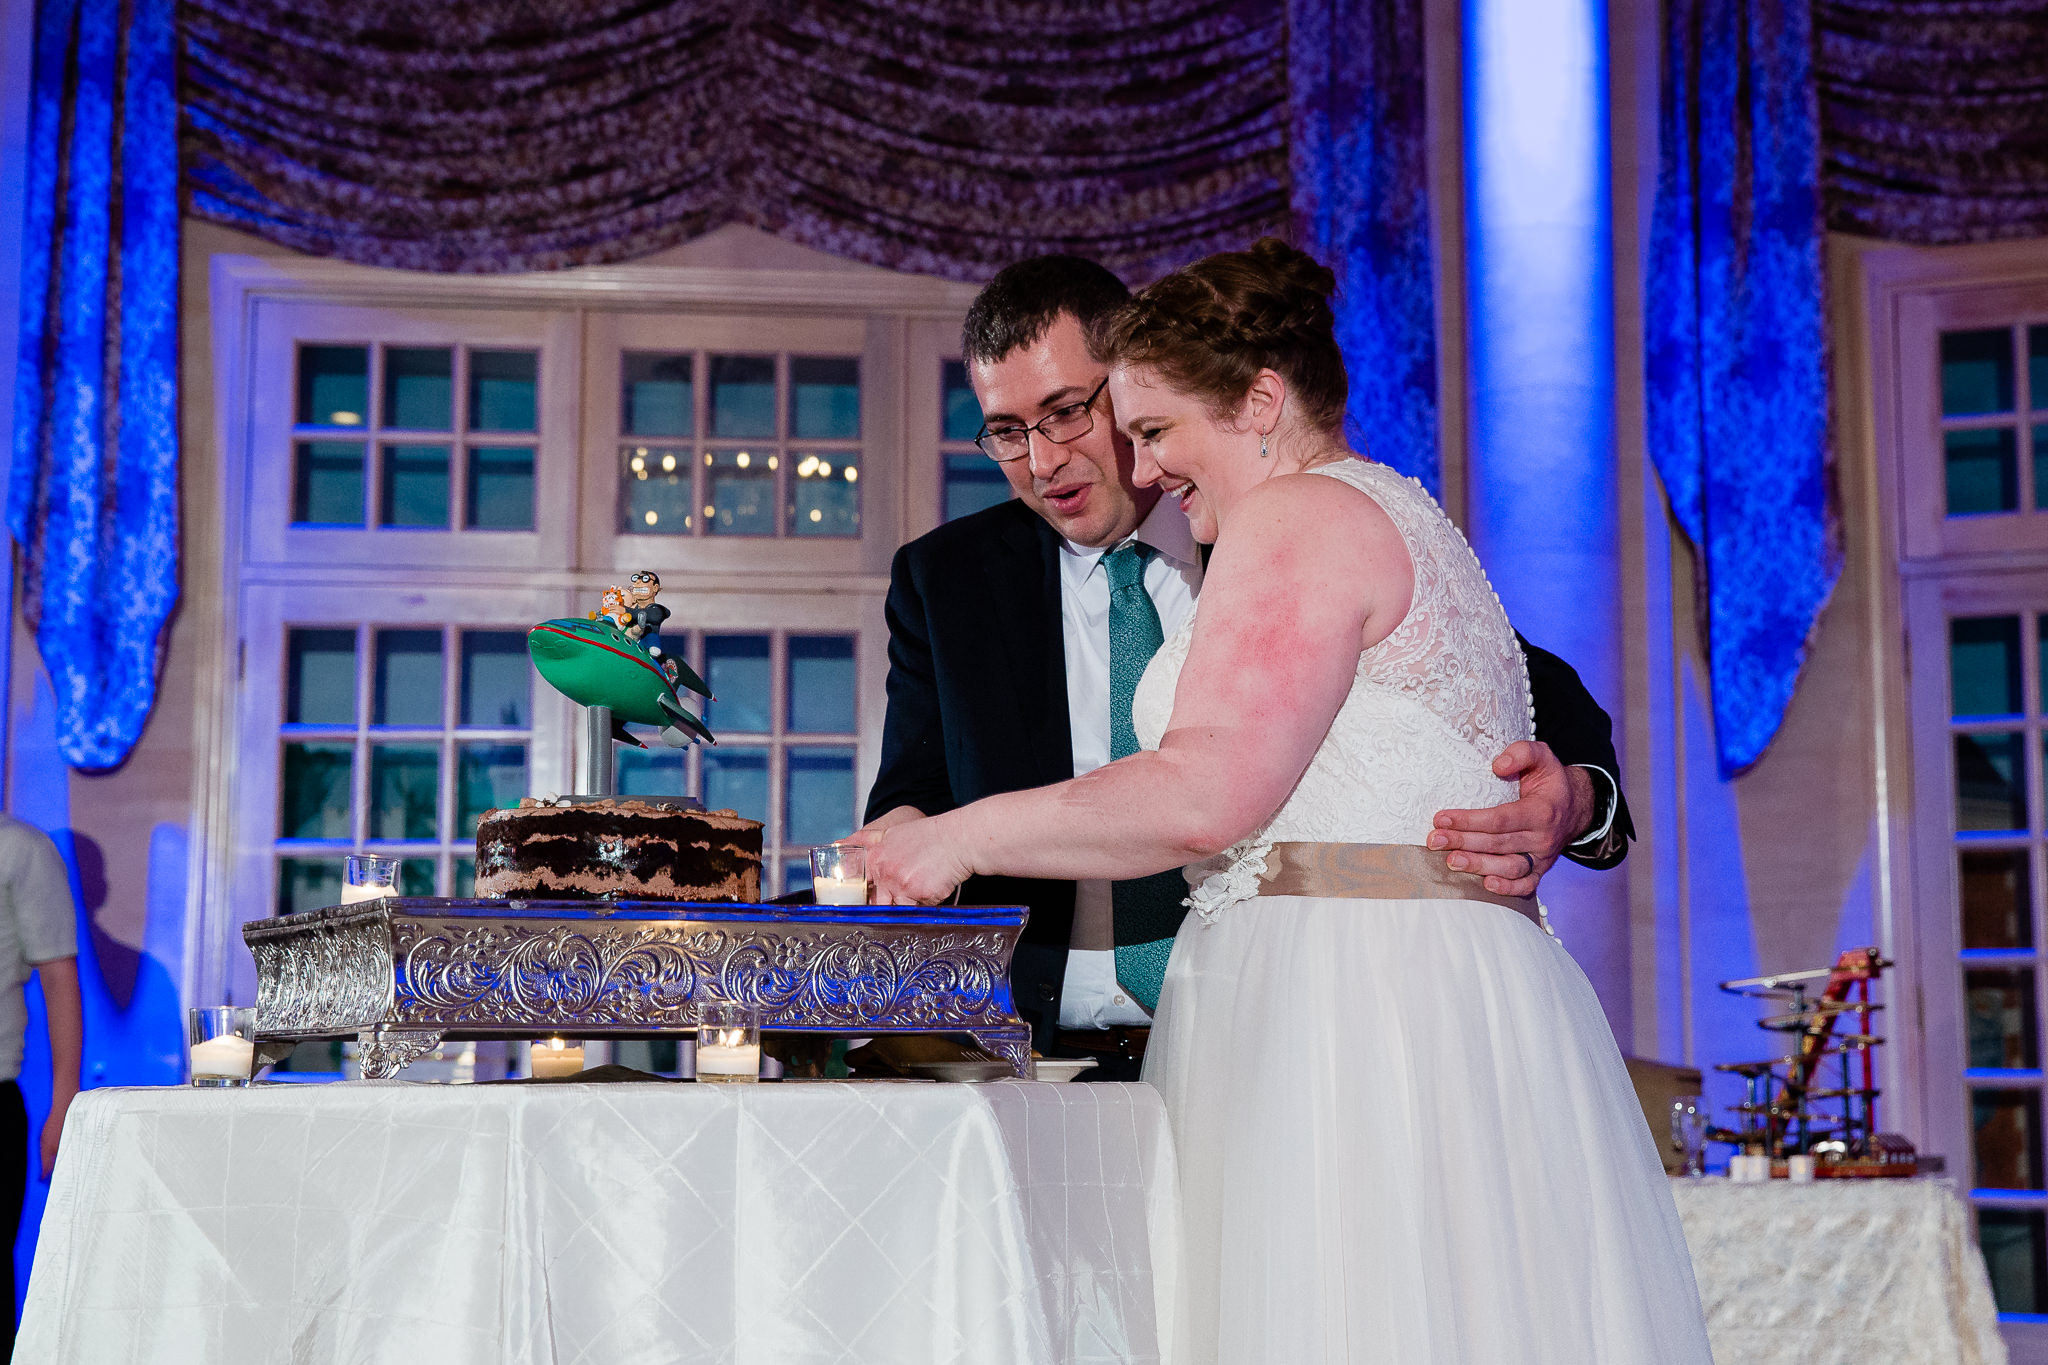 couple cuts momofuku milk bar wedding cake with futurama wedding cake topper